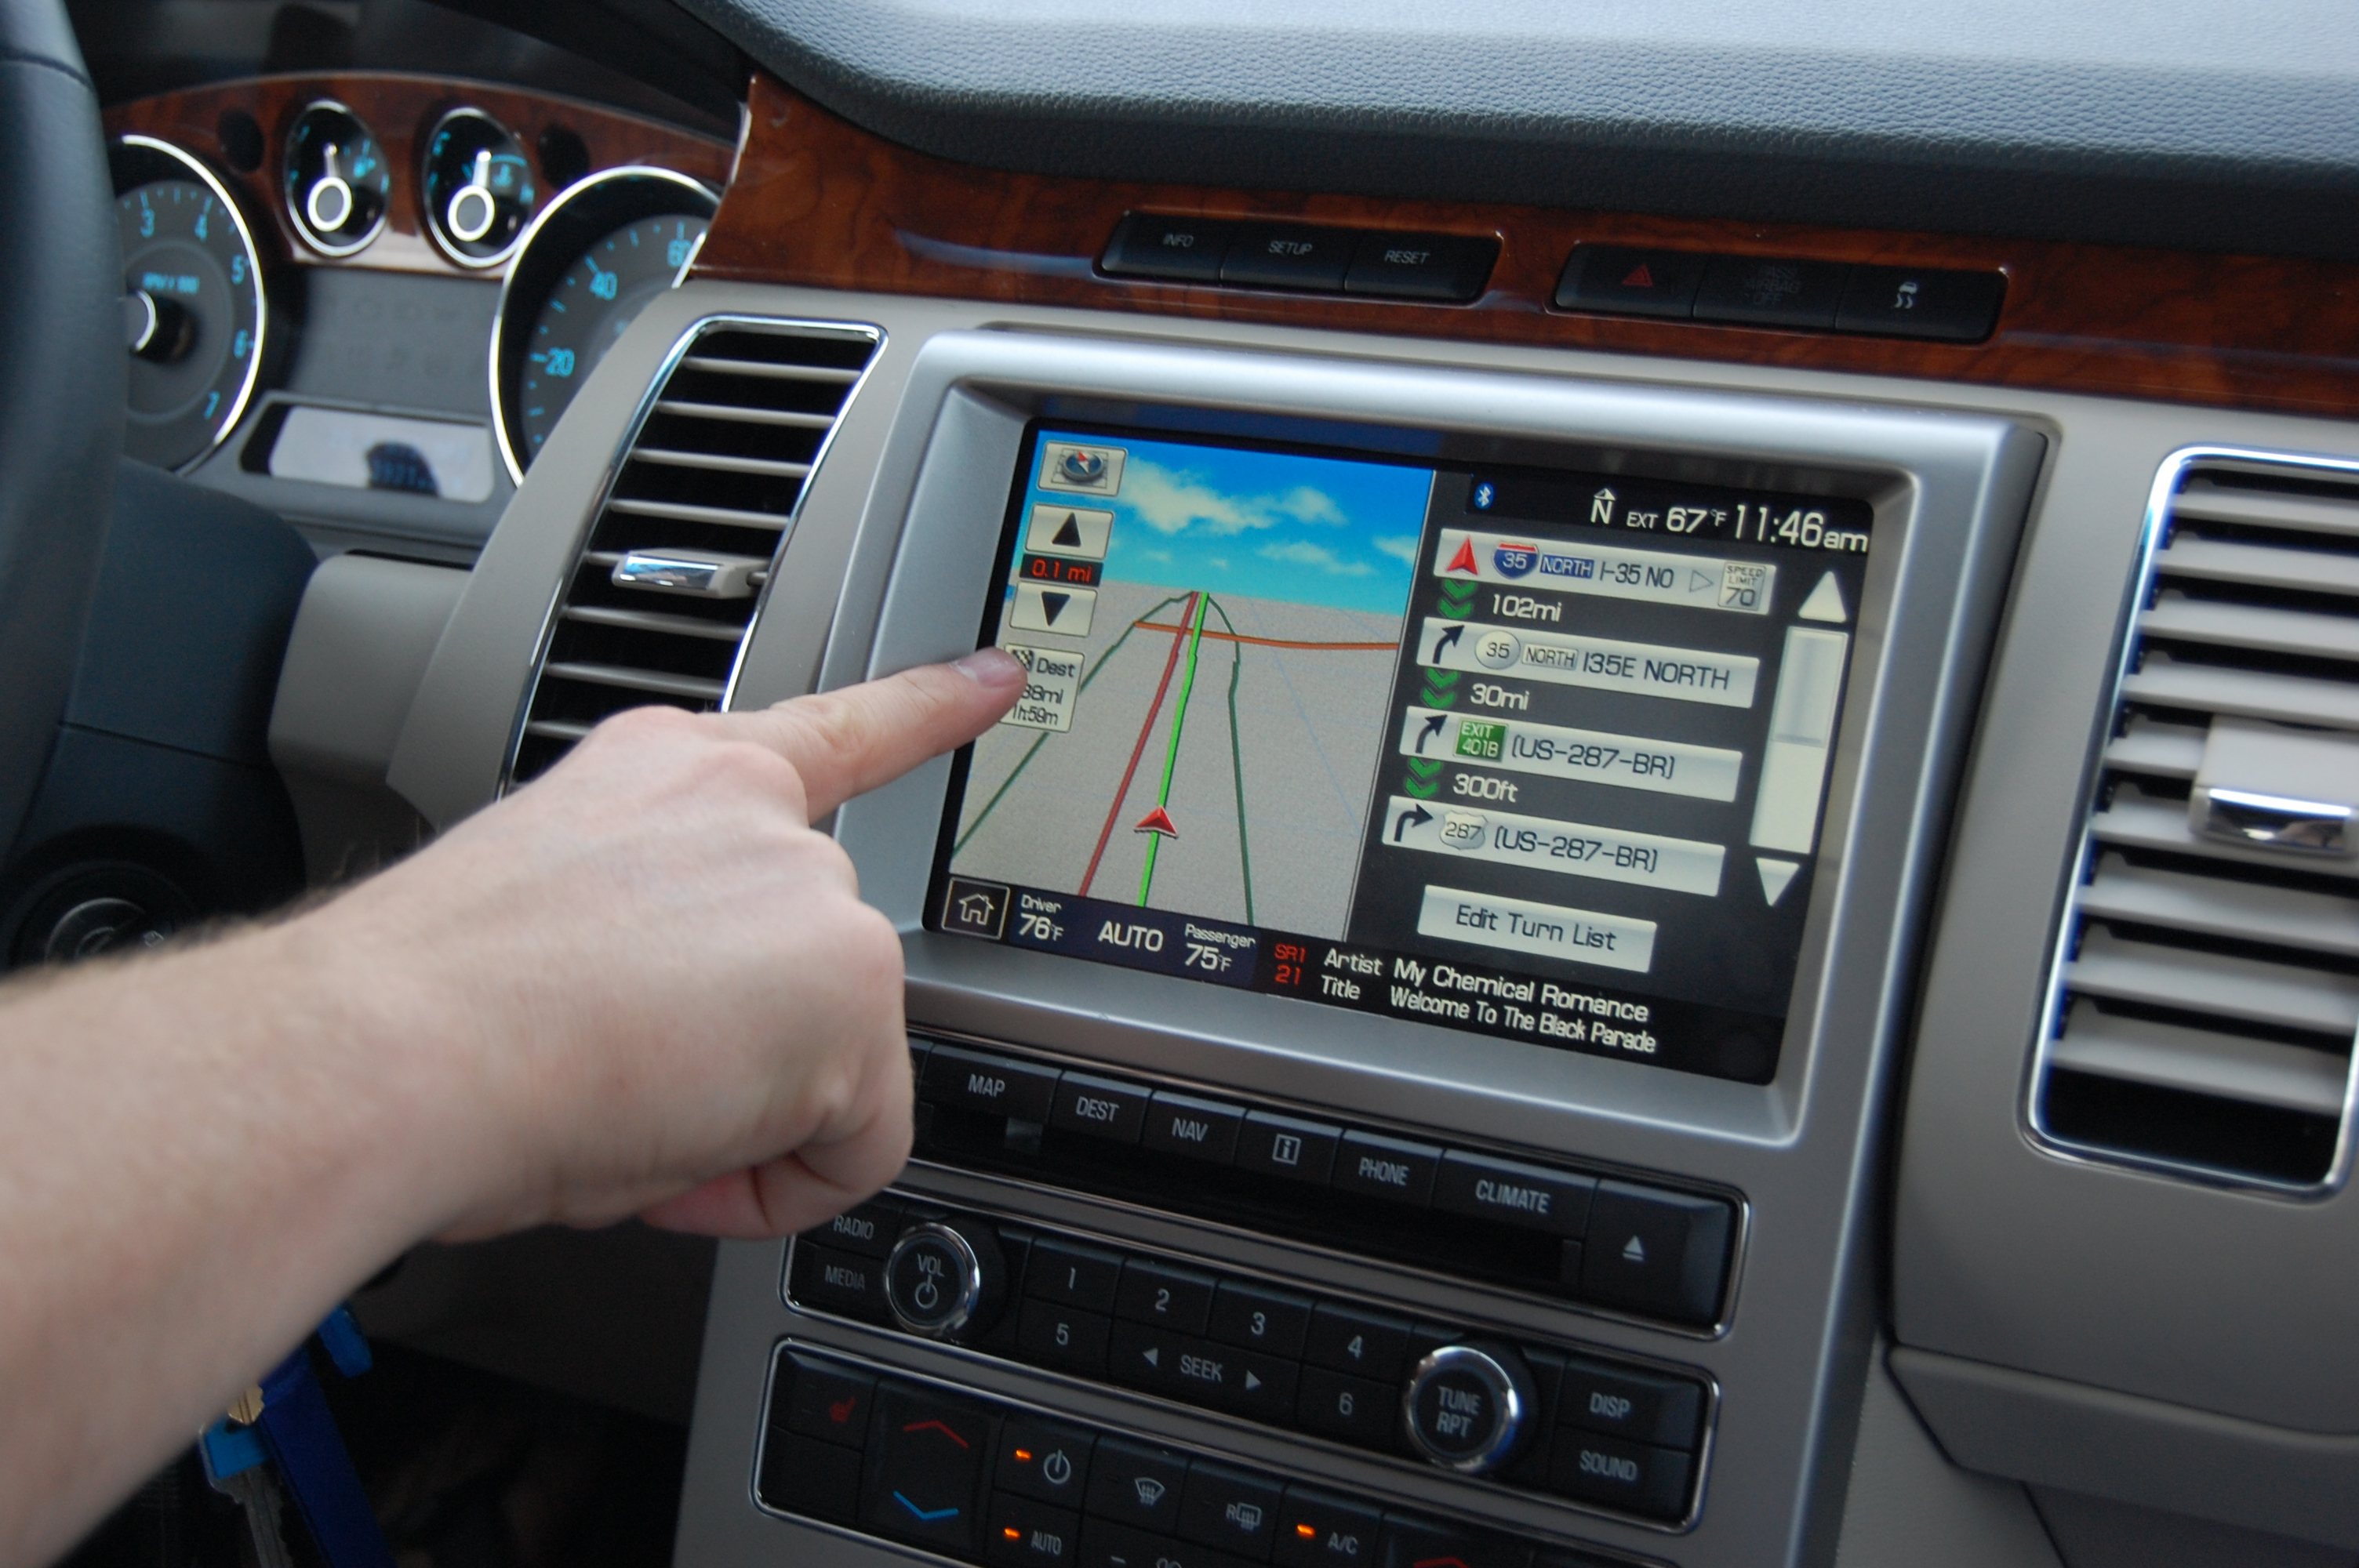 Automotive screens